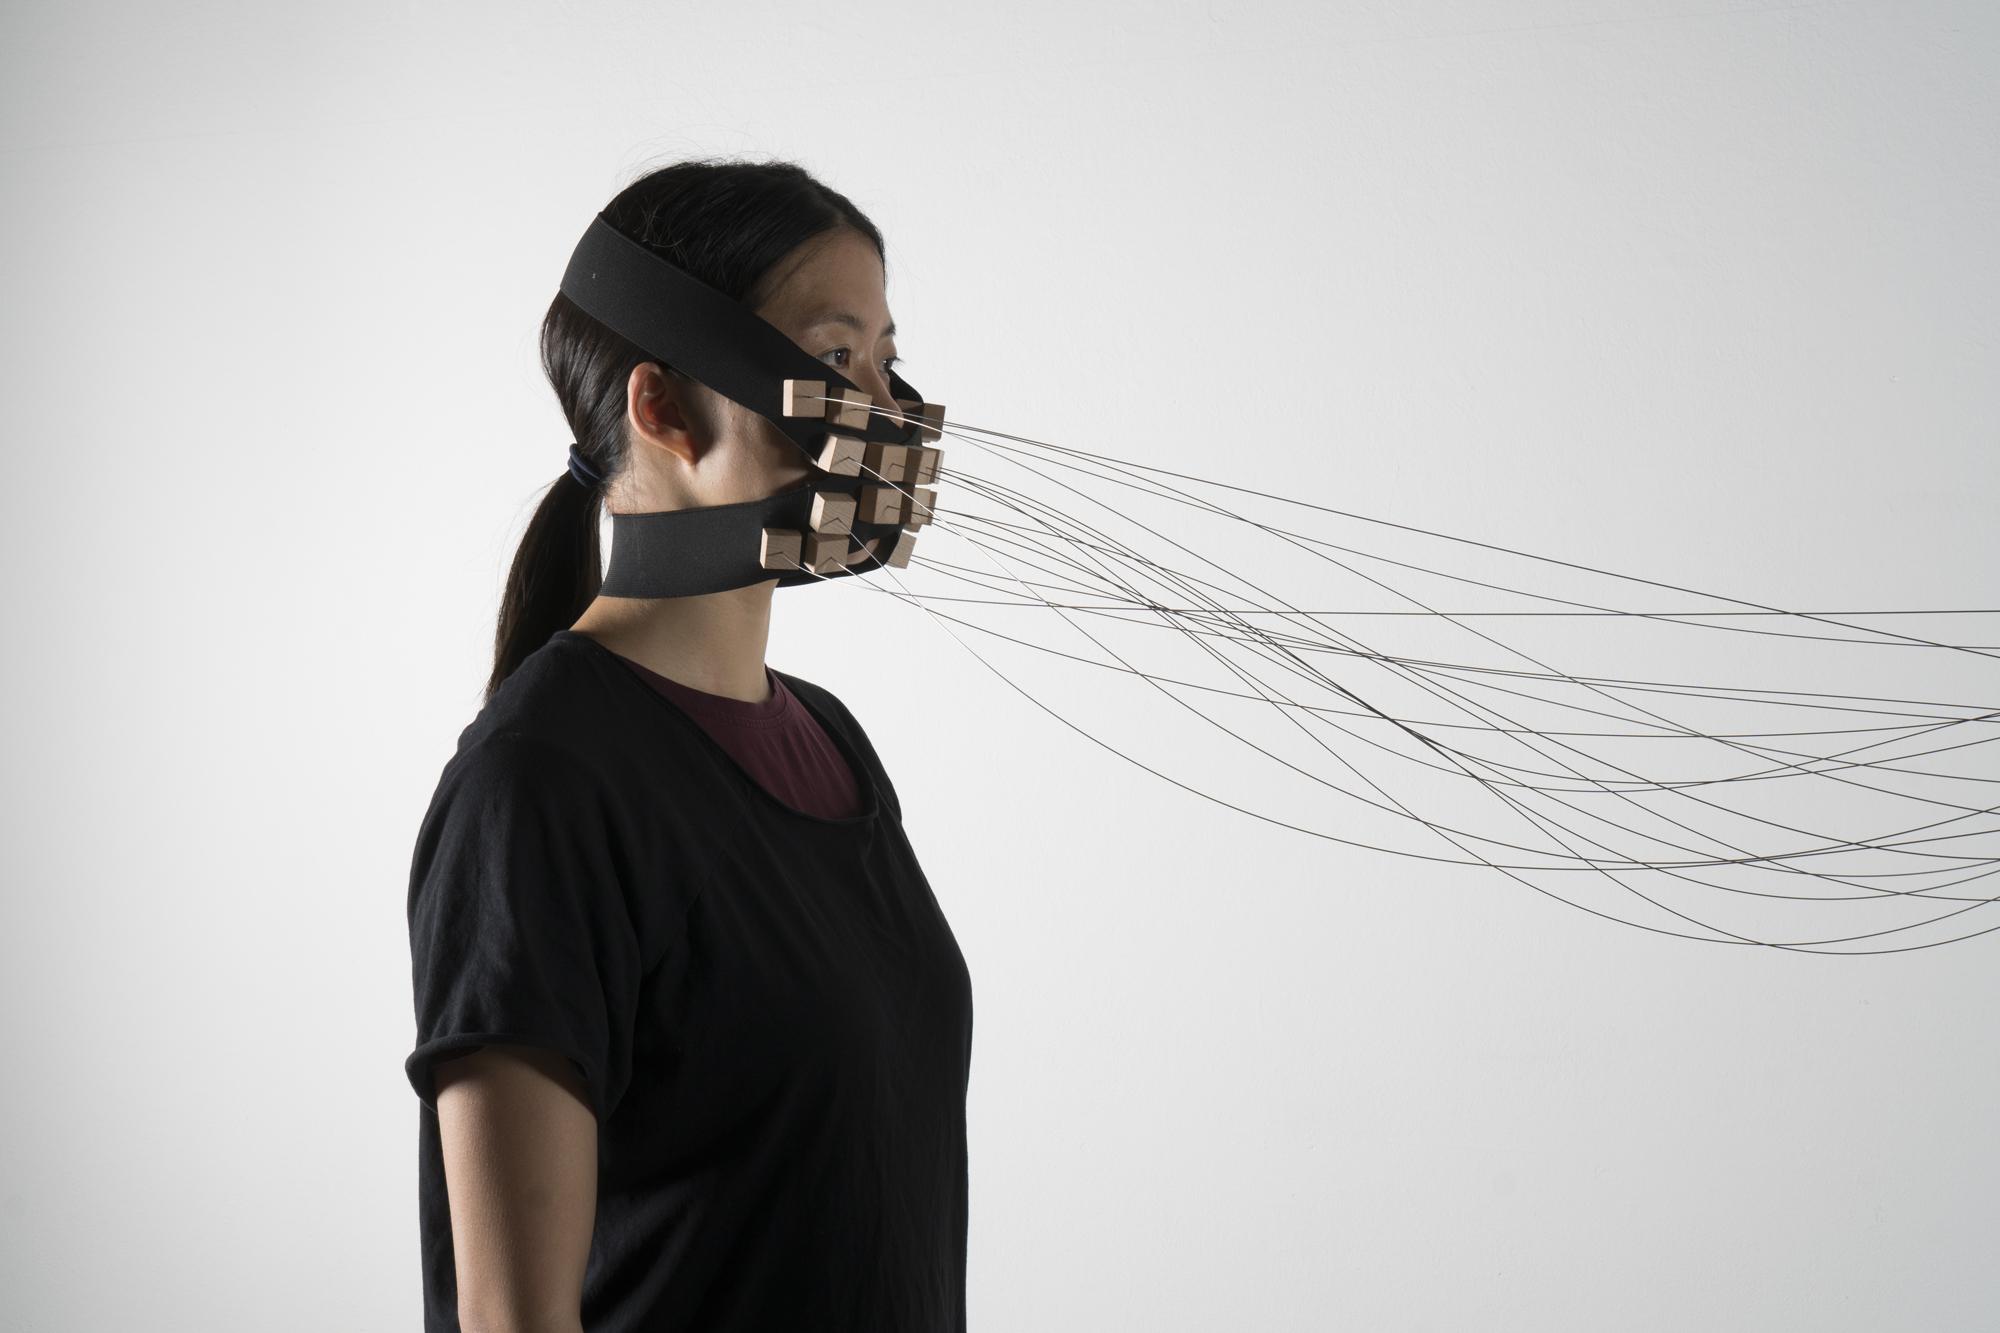 Phase 4 - Hybride - konfrontatives Experiment - Maskierung Autoren: Chih-Yu Chang & Lu Cheng Photo: J. Cafuk / Y. Kaiser